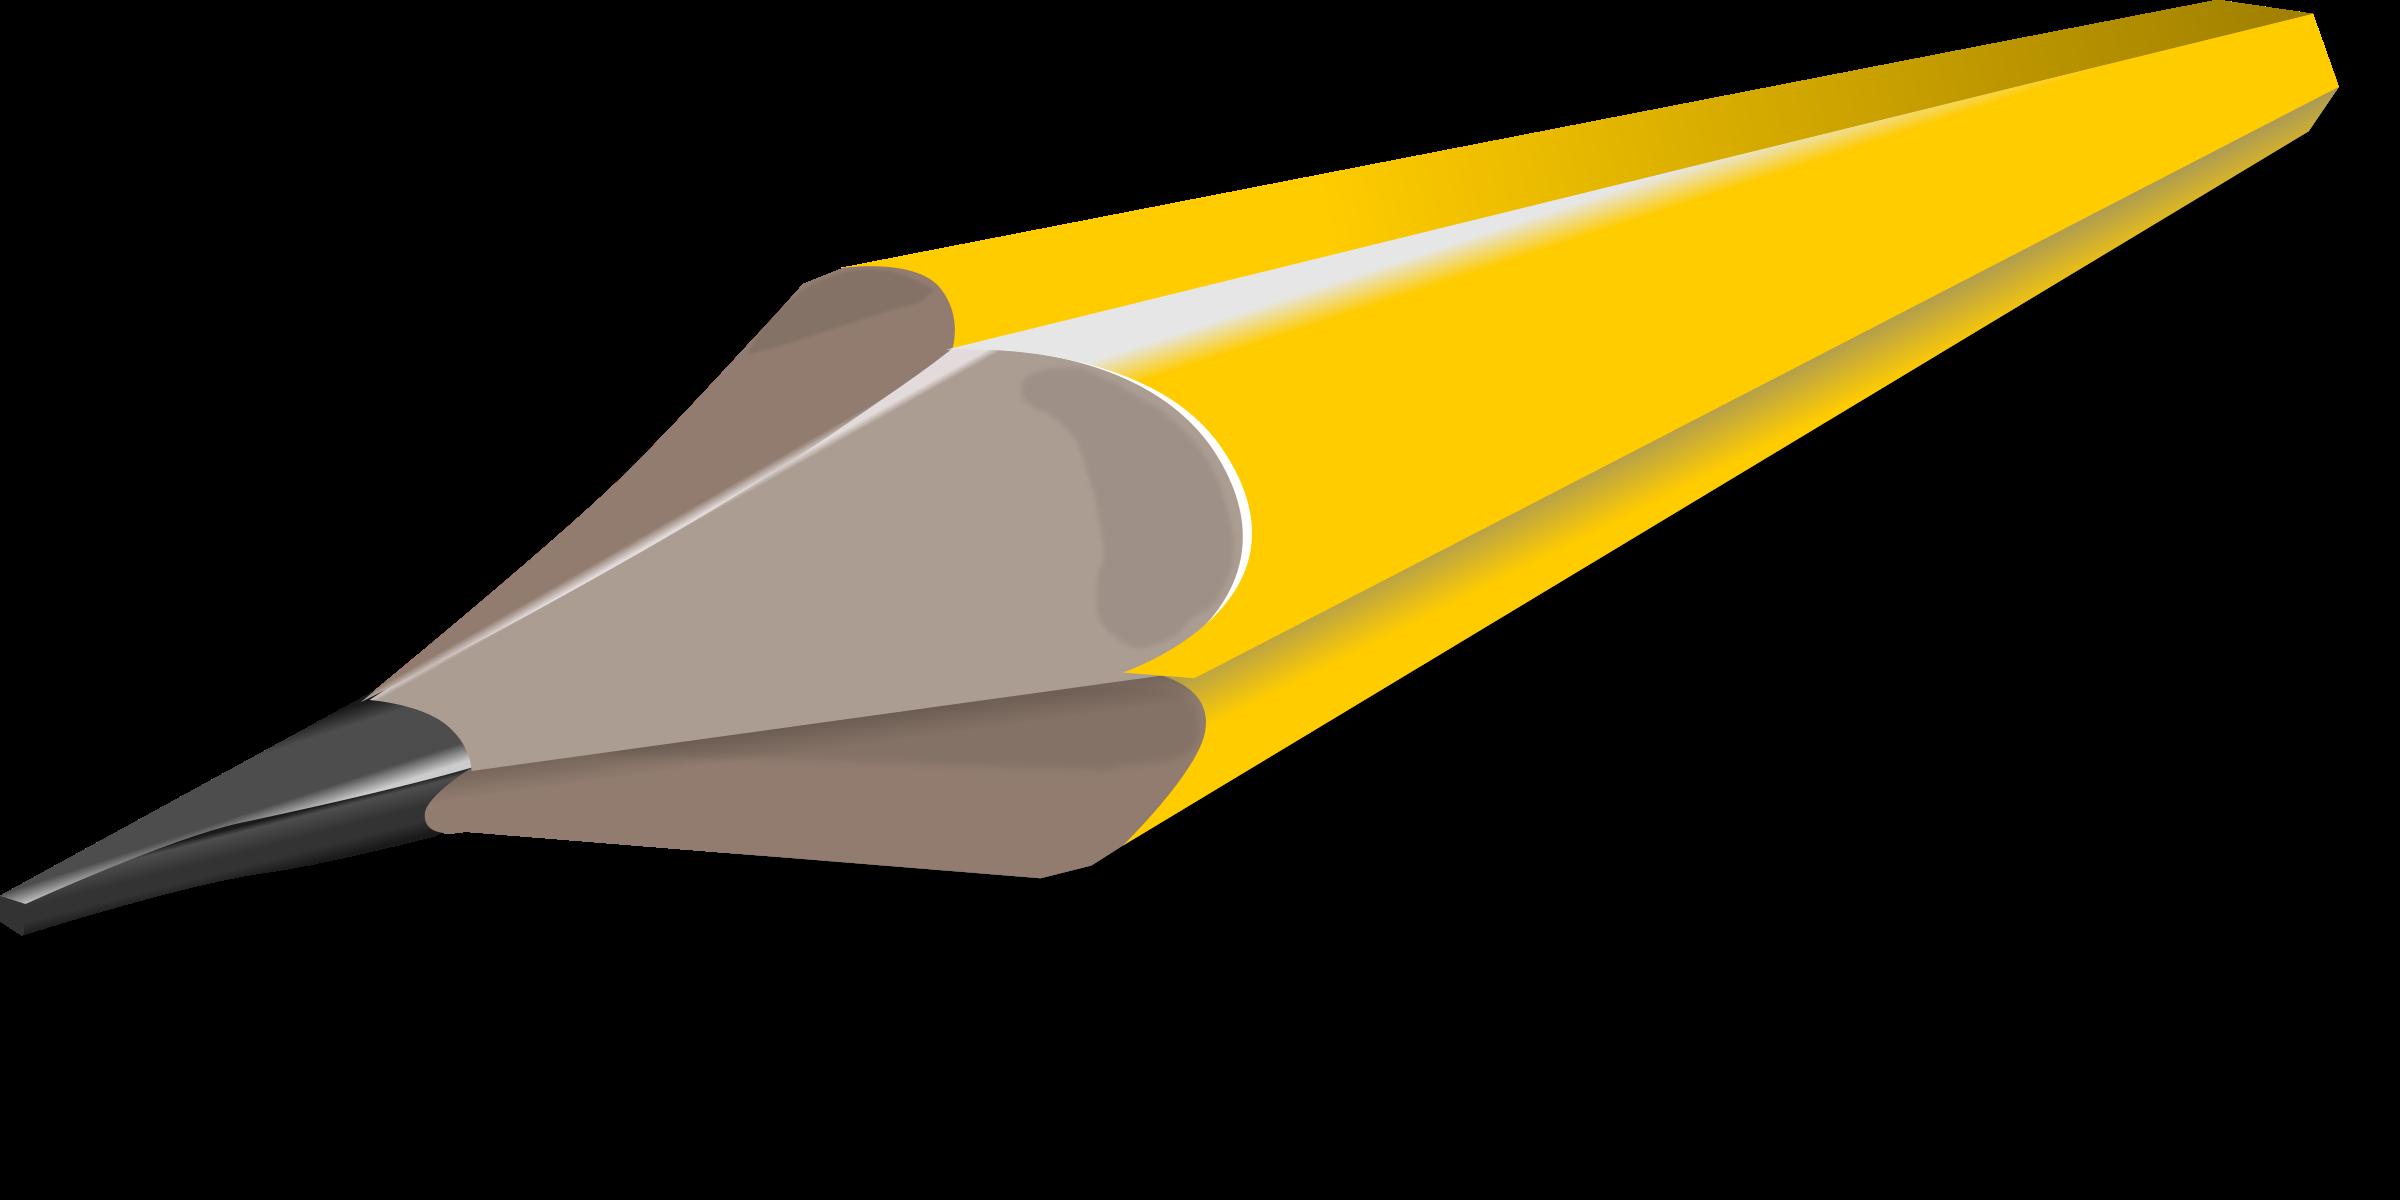 Pencil clipart sharp pencil Pencil pencil Clipart